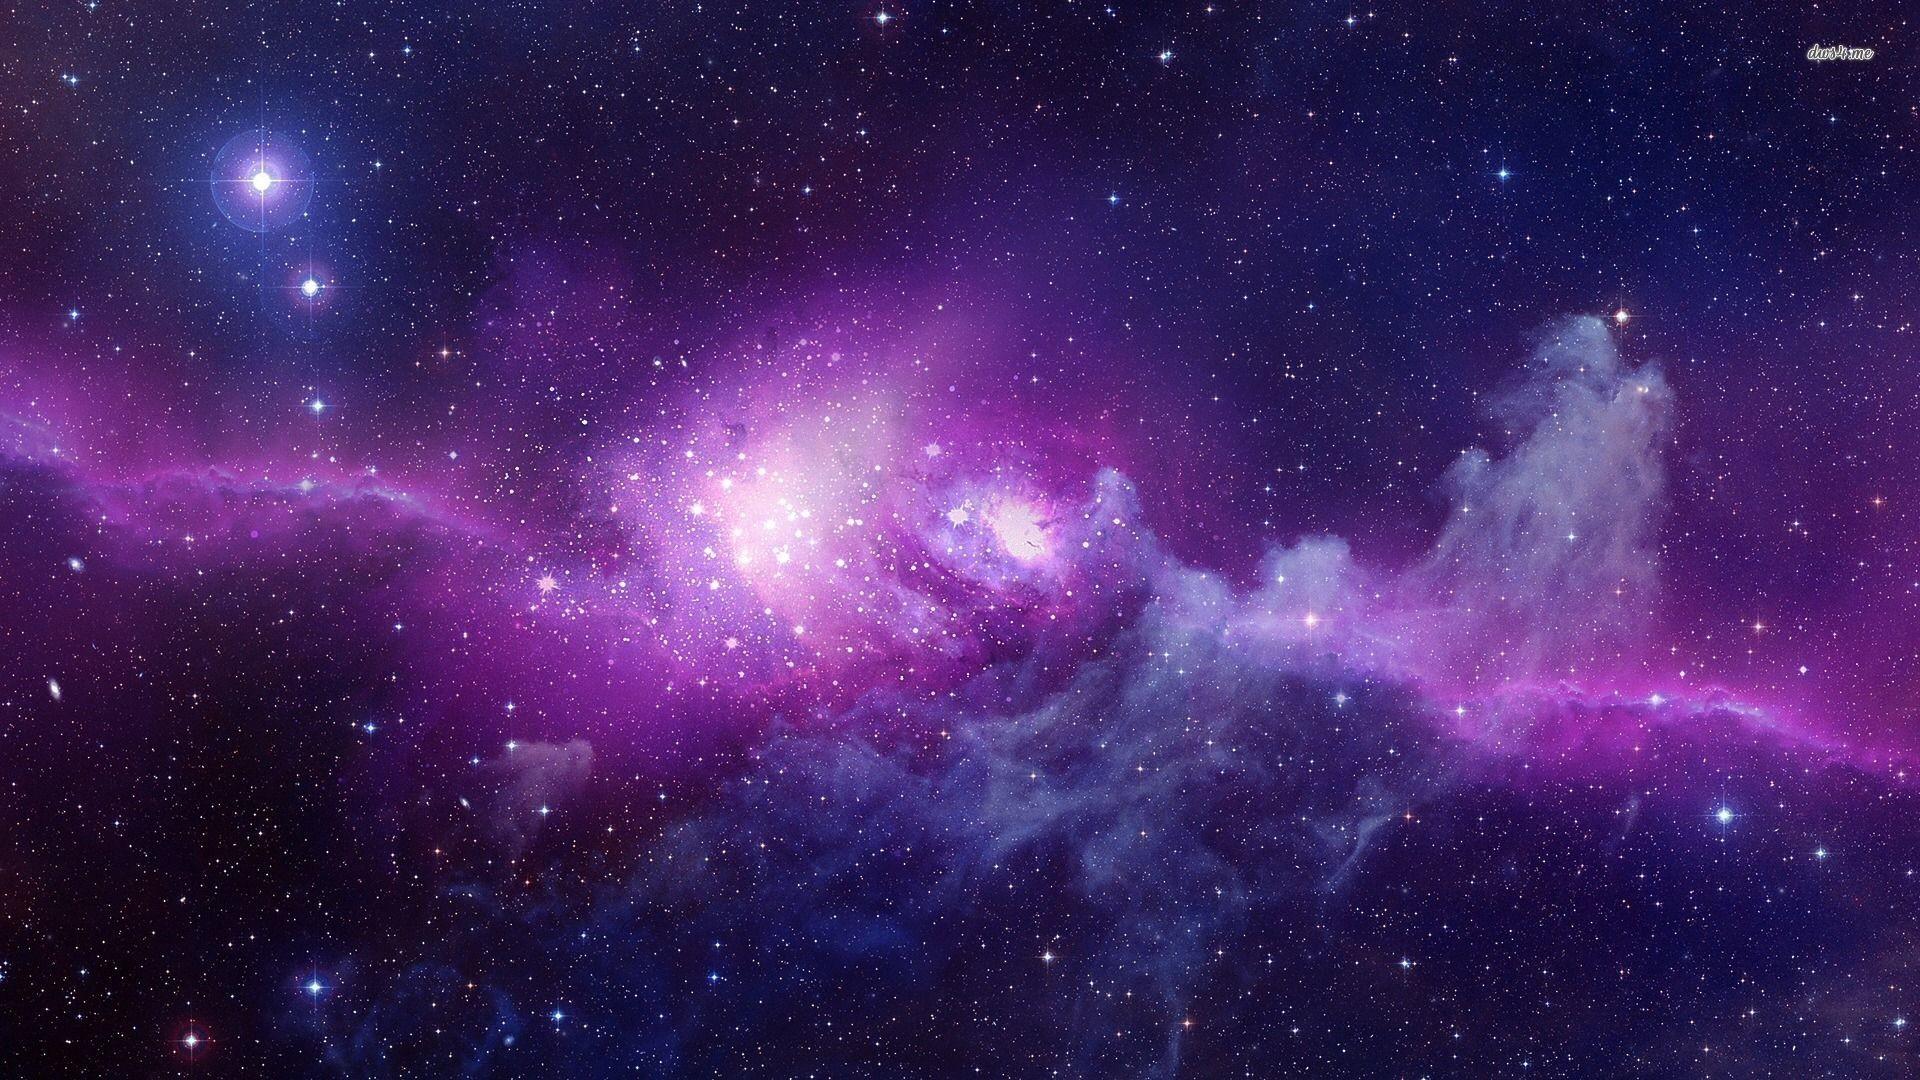 Galaxy phone wallpaper 73 images - 720 x 1080 wallpaper ...